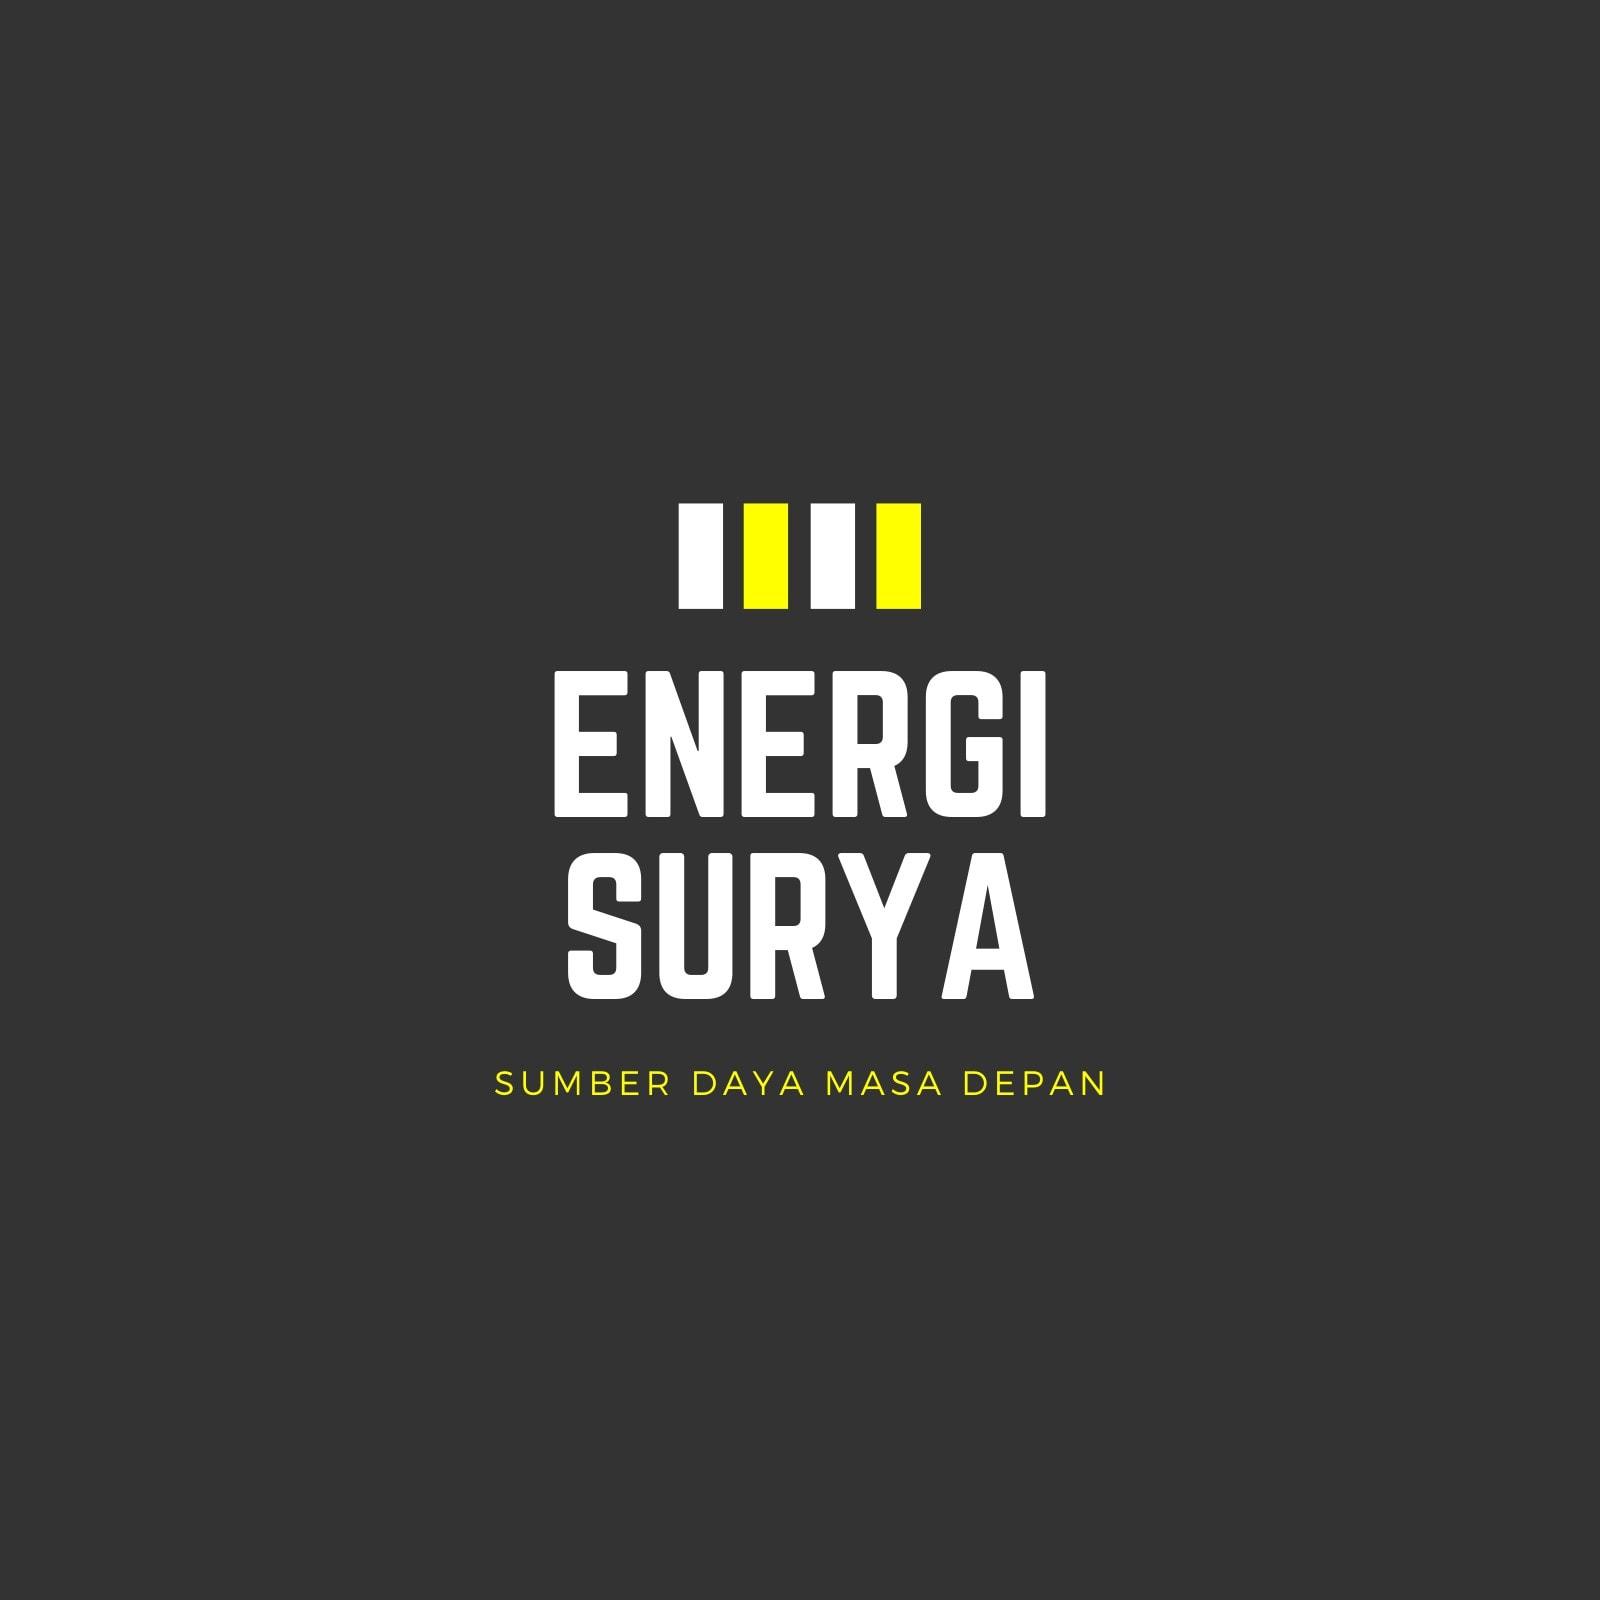 Abu-abu Tua Garis Industri Logo